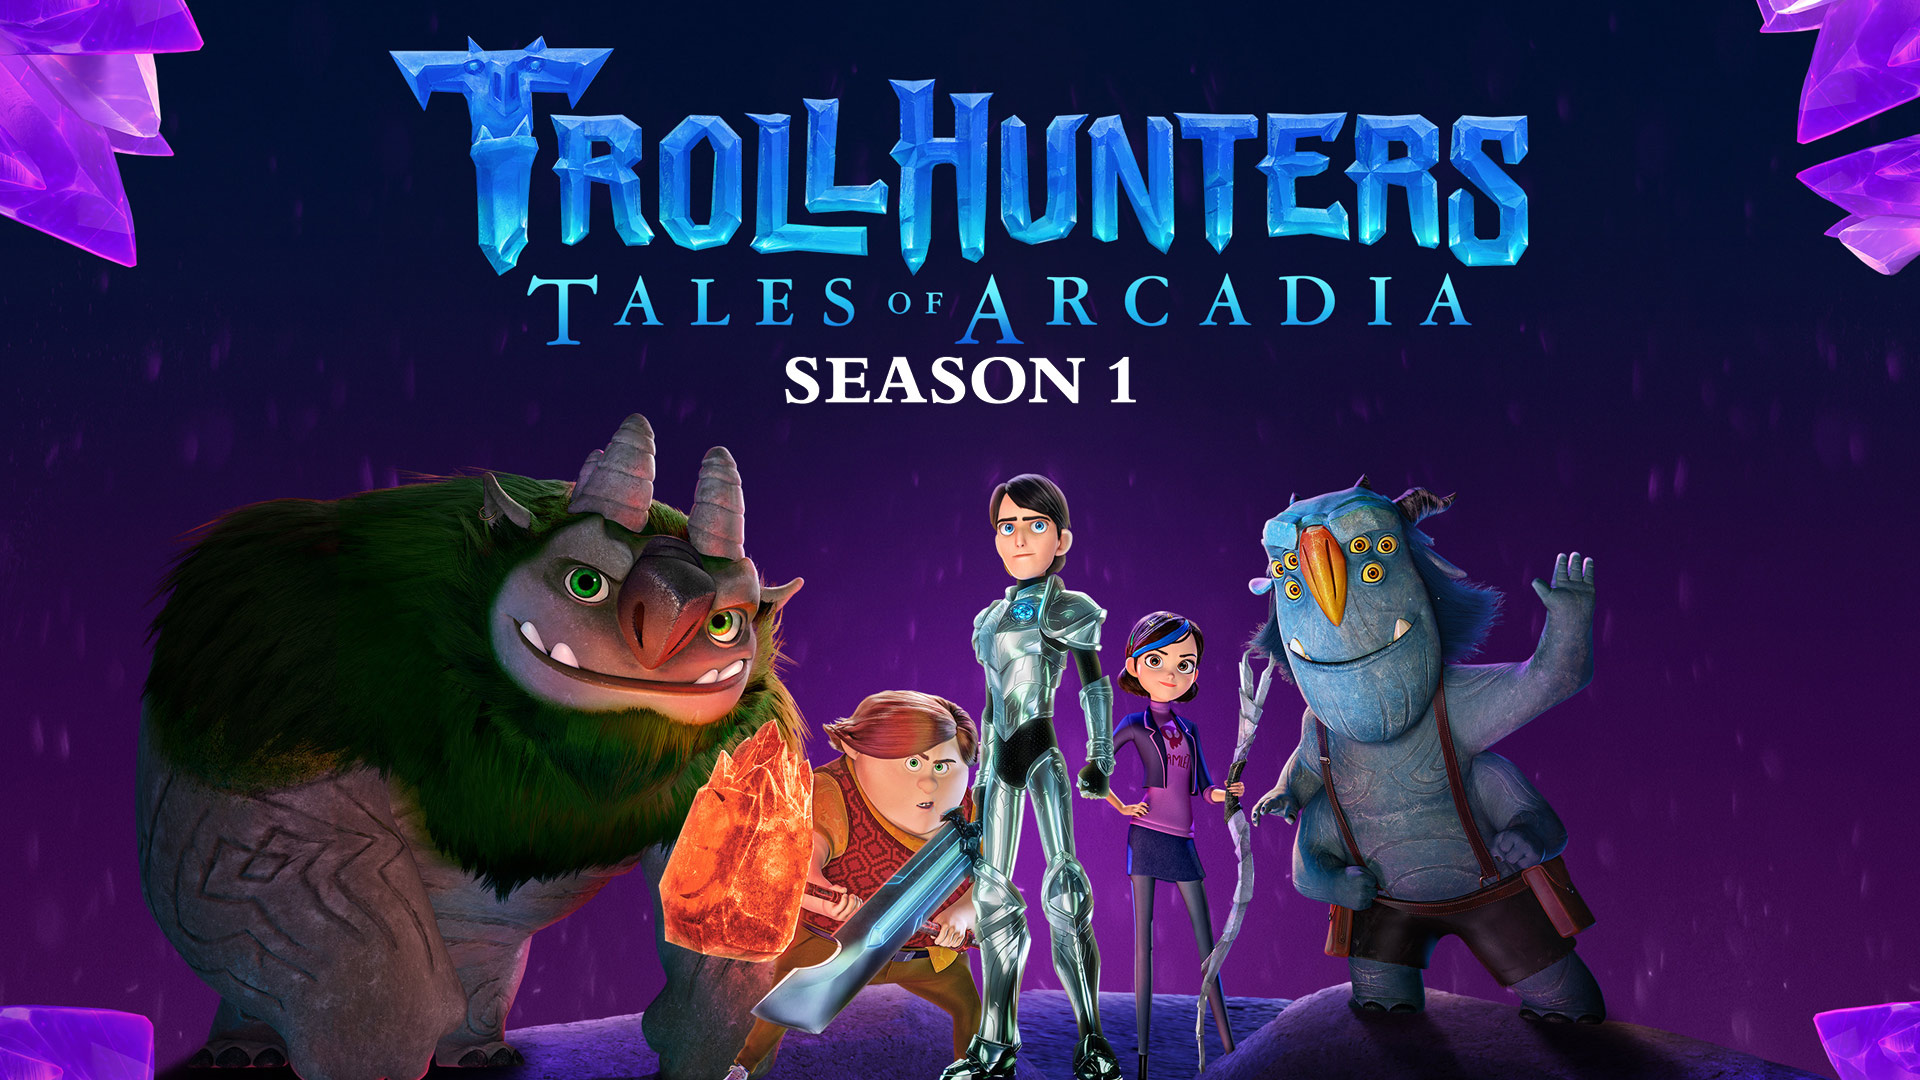 Trollhunters, Season 1